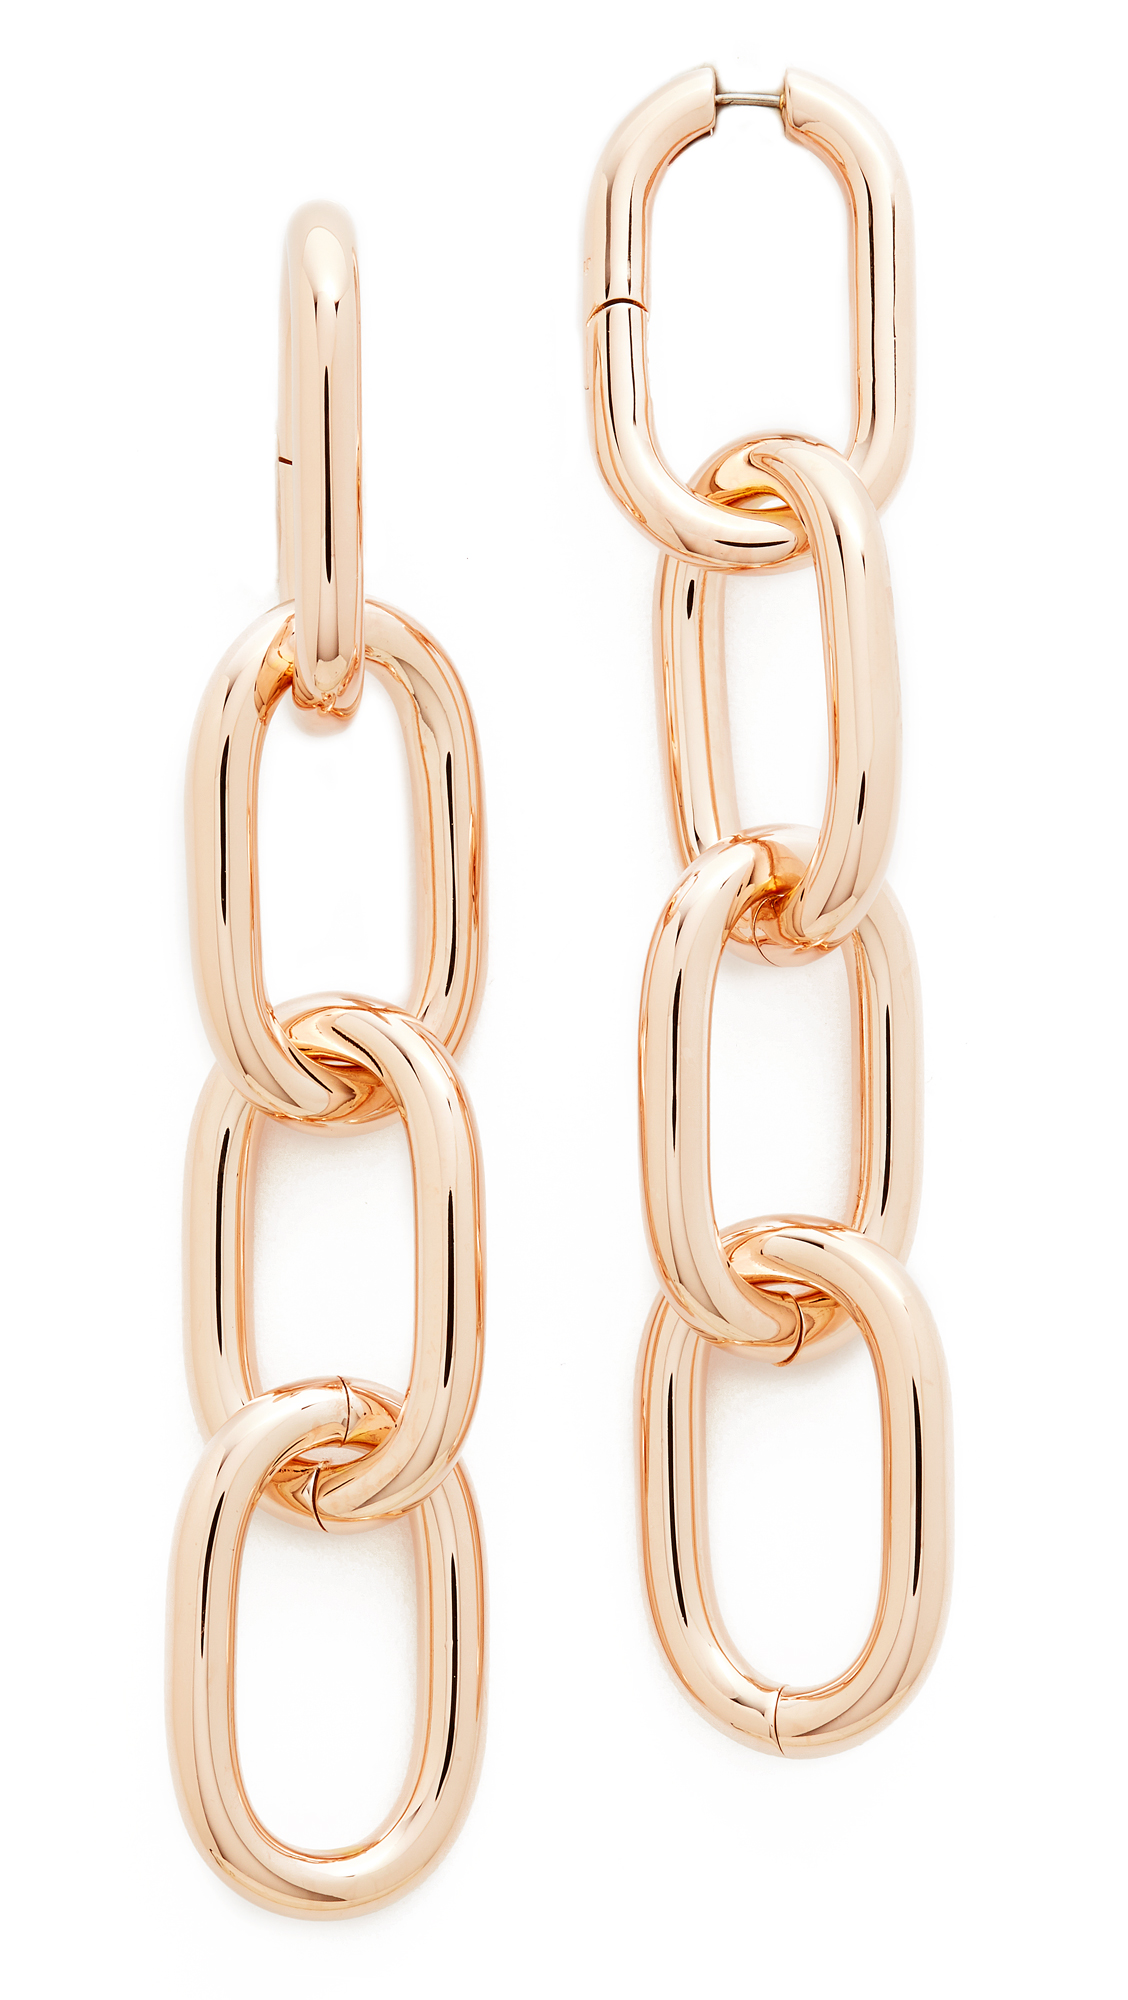 Alexander Wang Four Link Earrings - Rose Gold